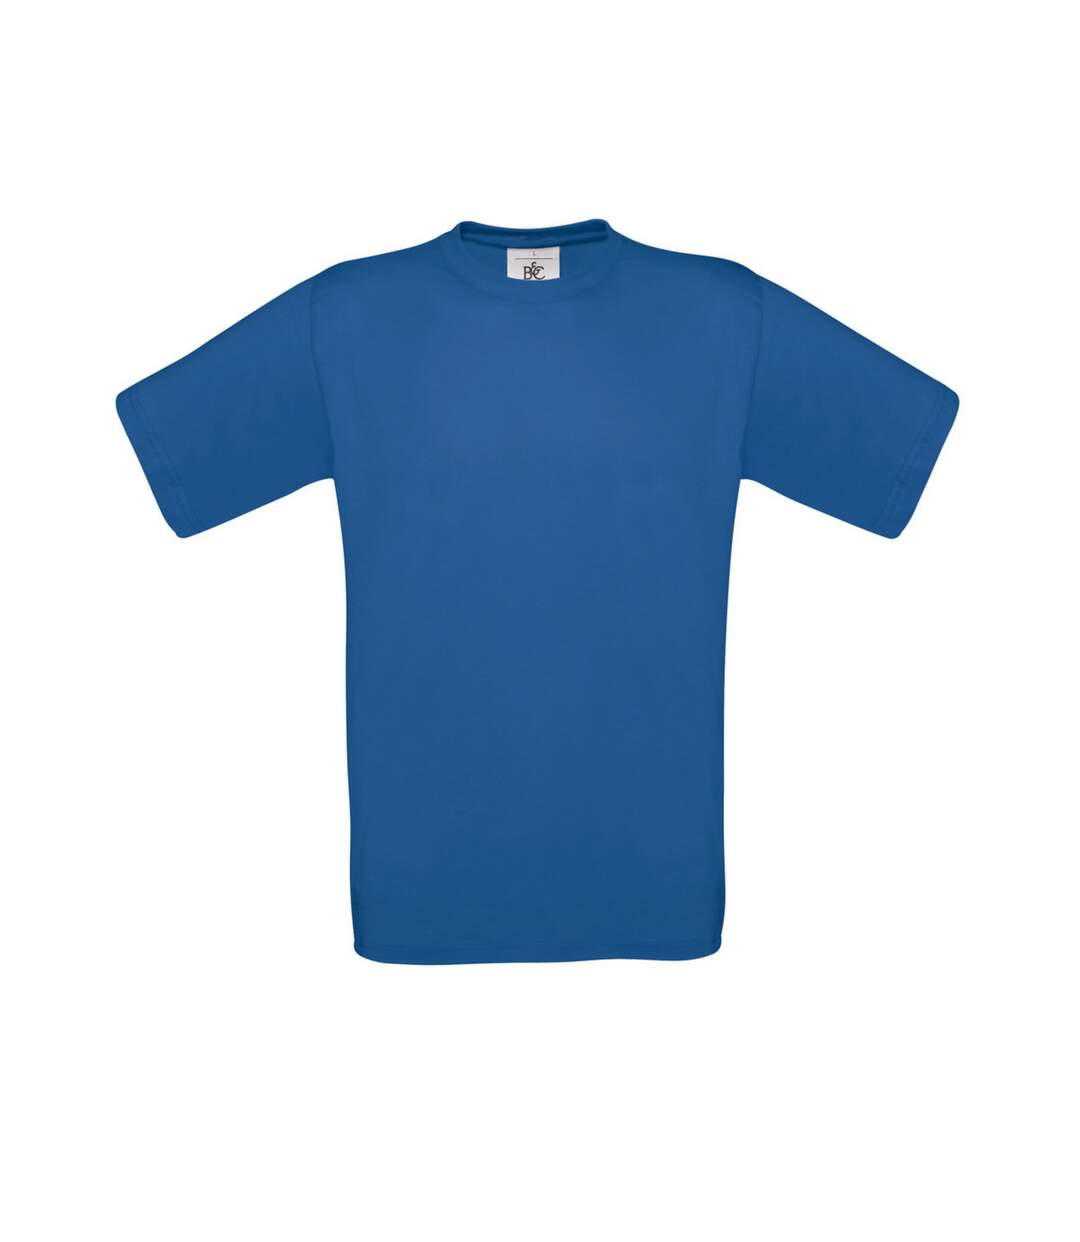 B&C Mens Exact 150 Short Sleeve T-Shirt (Royal Blue) - UTBC1288